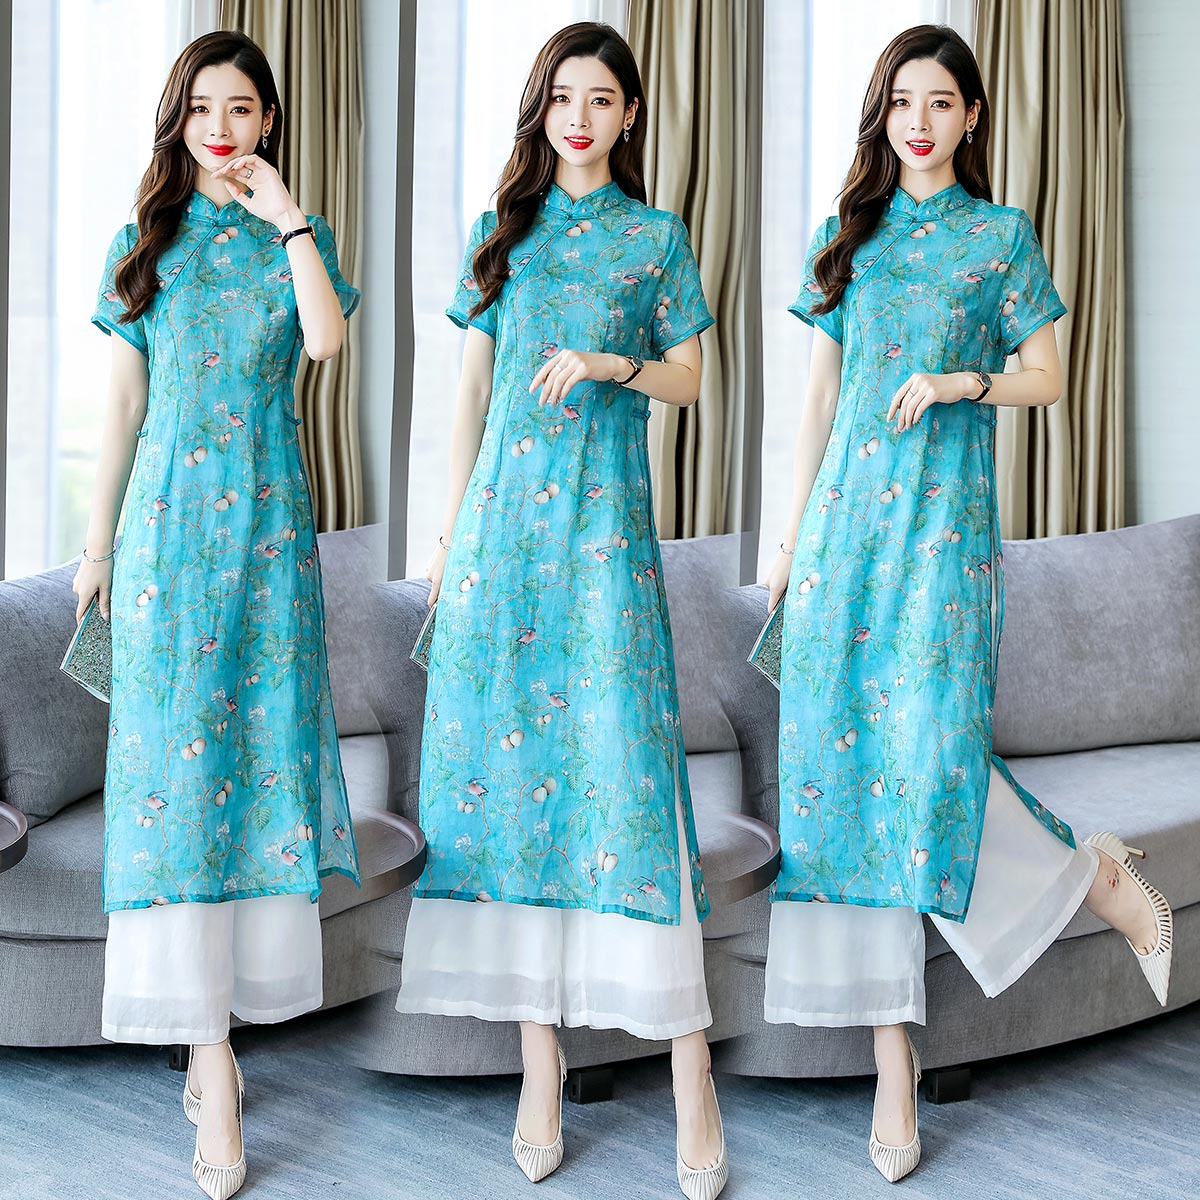 2019 Folk Style Ao Dai Vietnam Clothing Chiffon Aodai Graceful Dress Stand Collar Elegant Traditional Clothing Floral Aodai